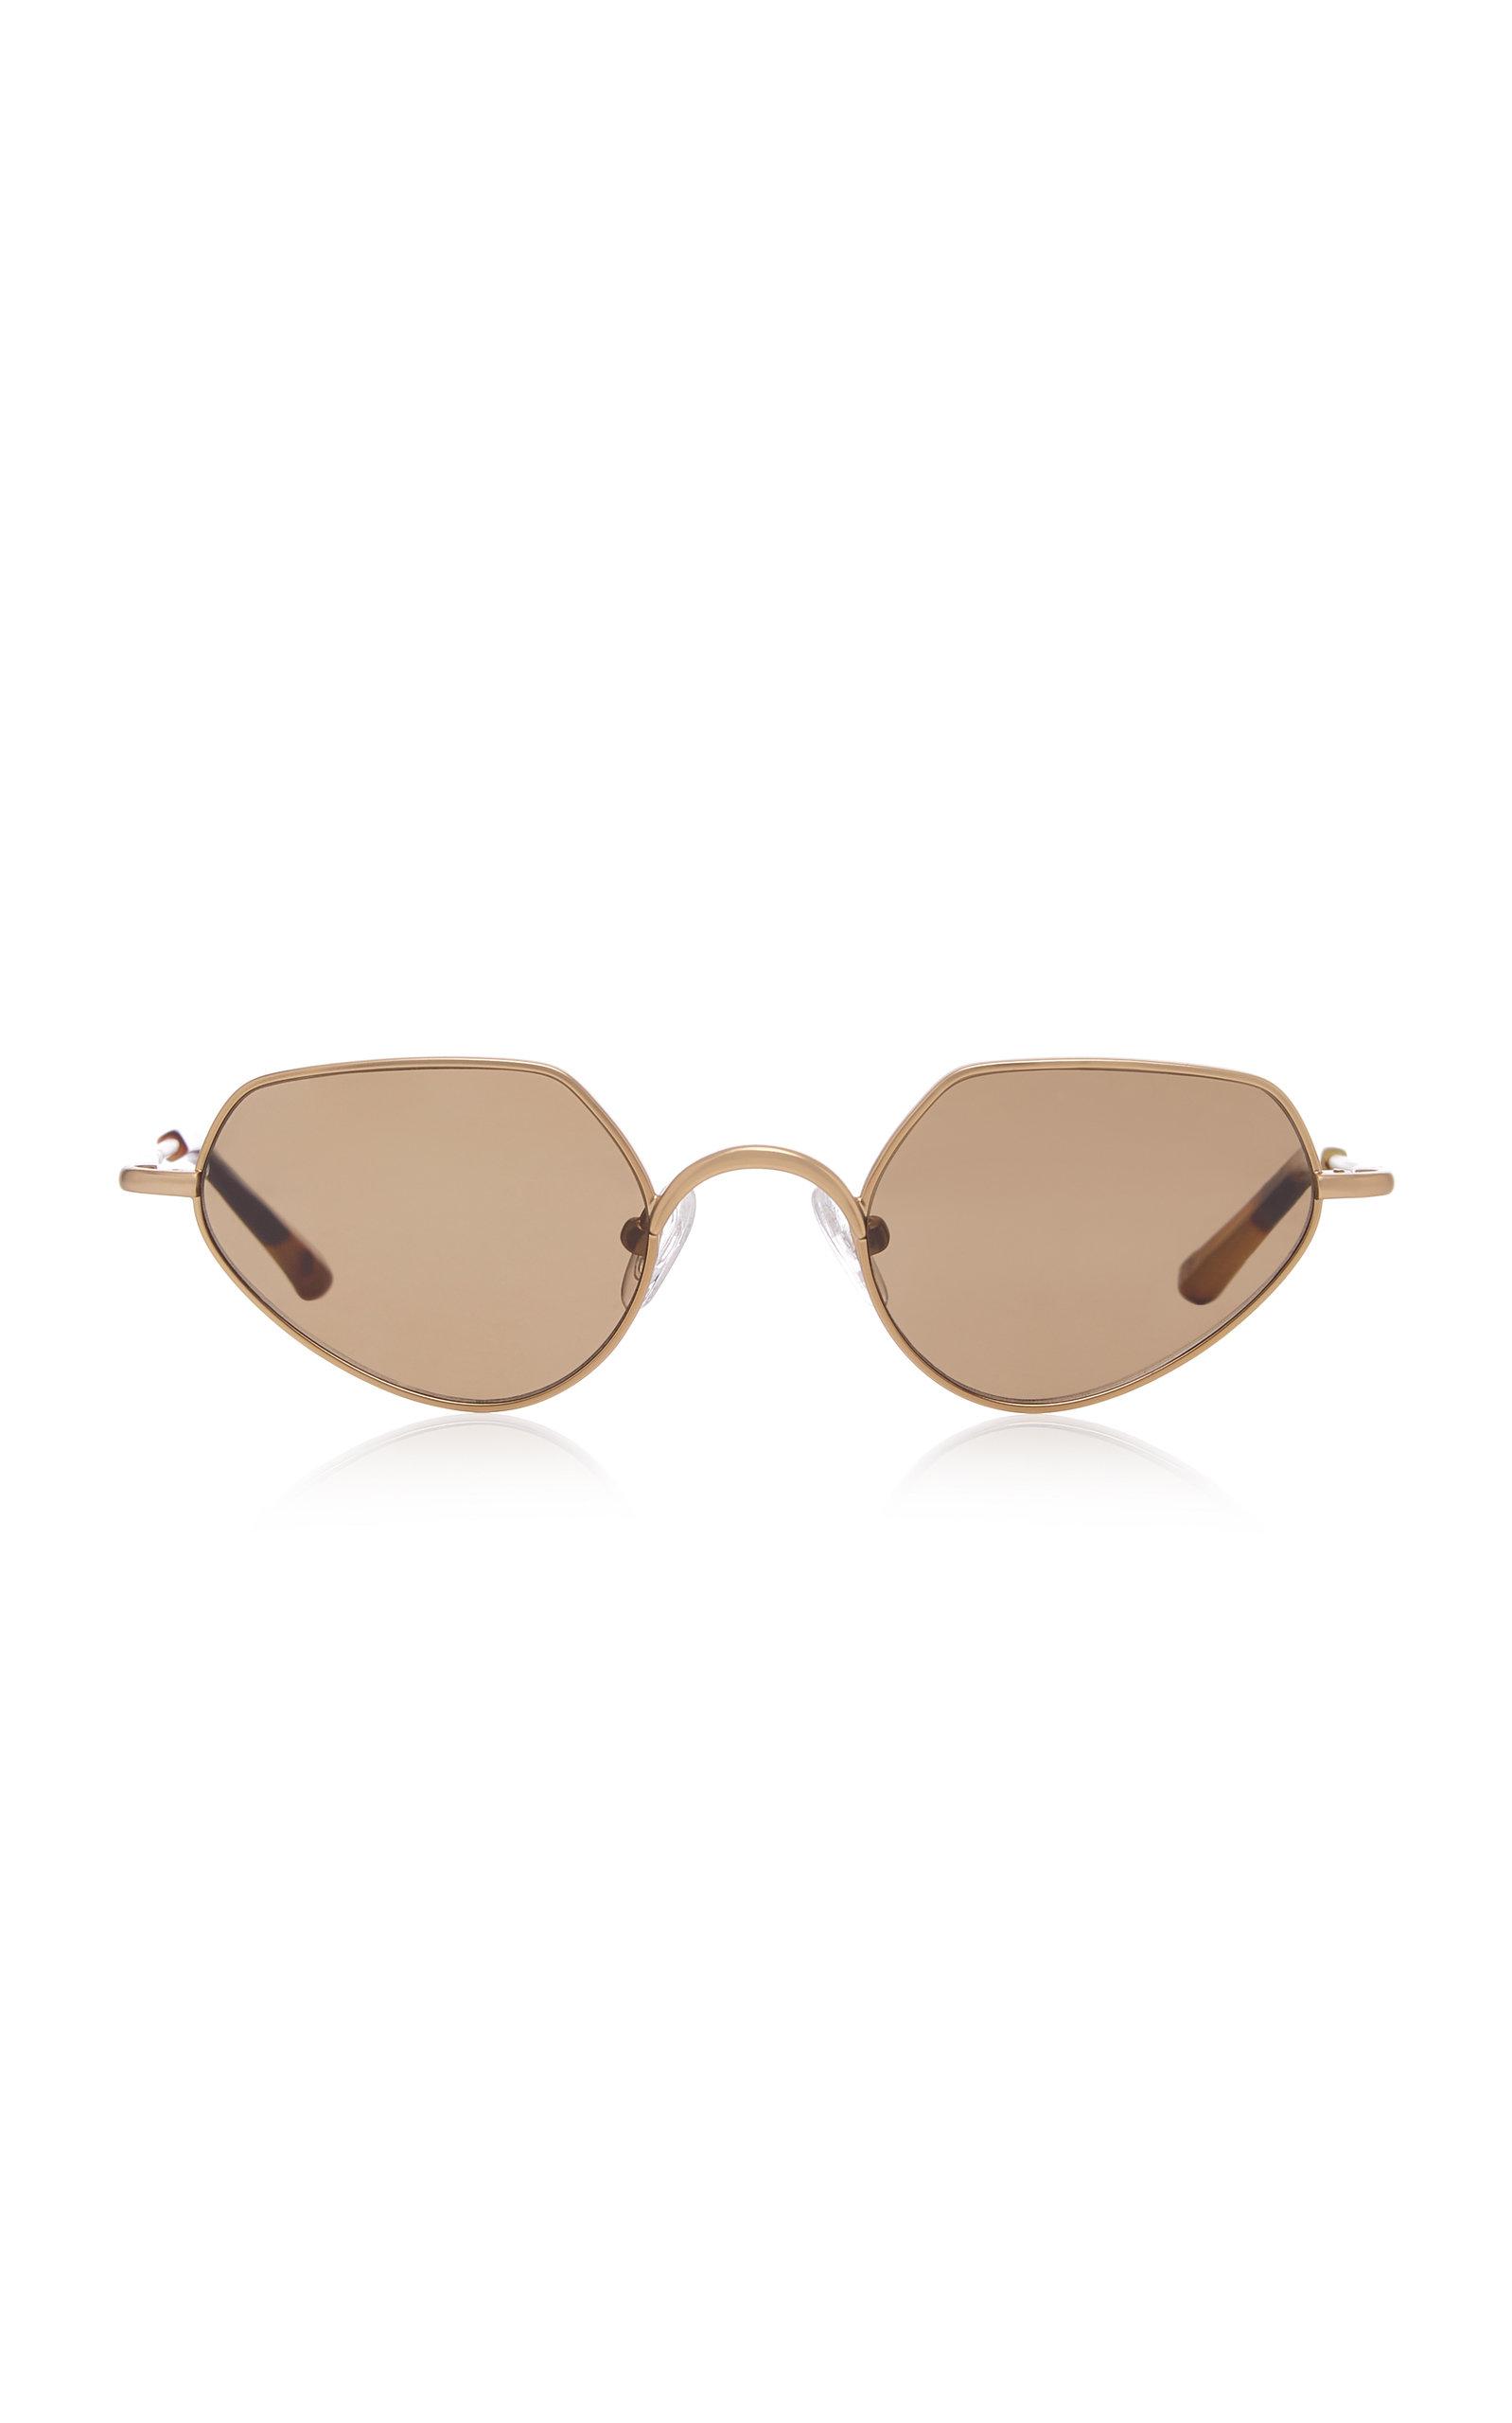 db324f4958d Dries Van NotenRound Stainless Steel Sunglasses. CLOSE. Loading